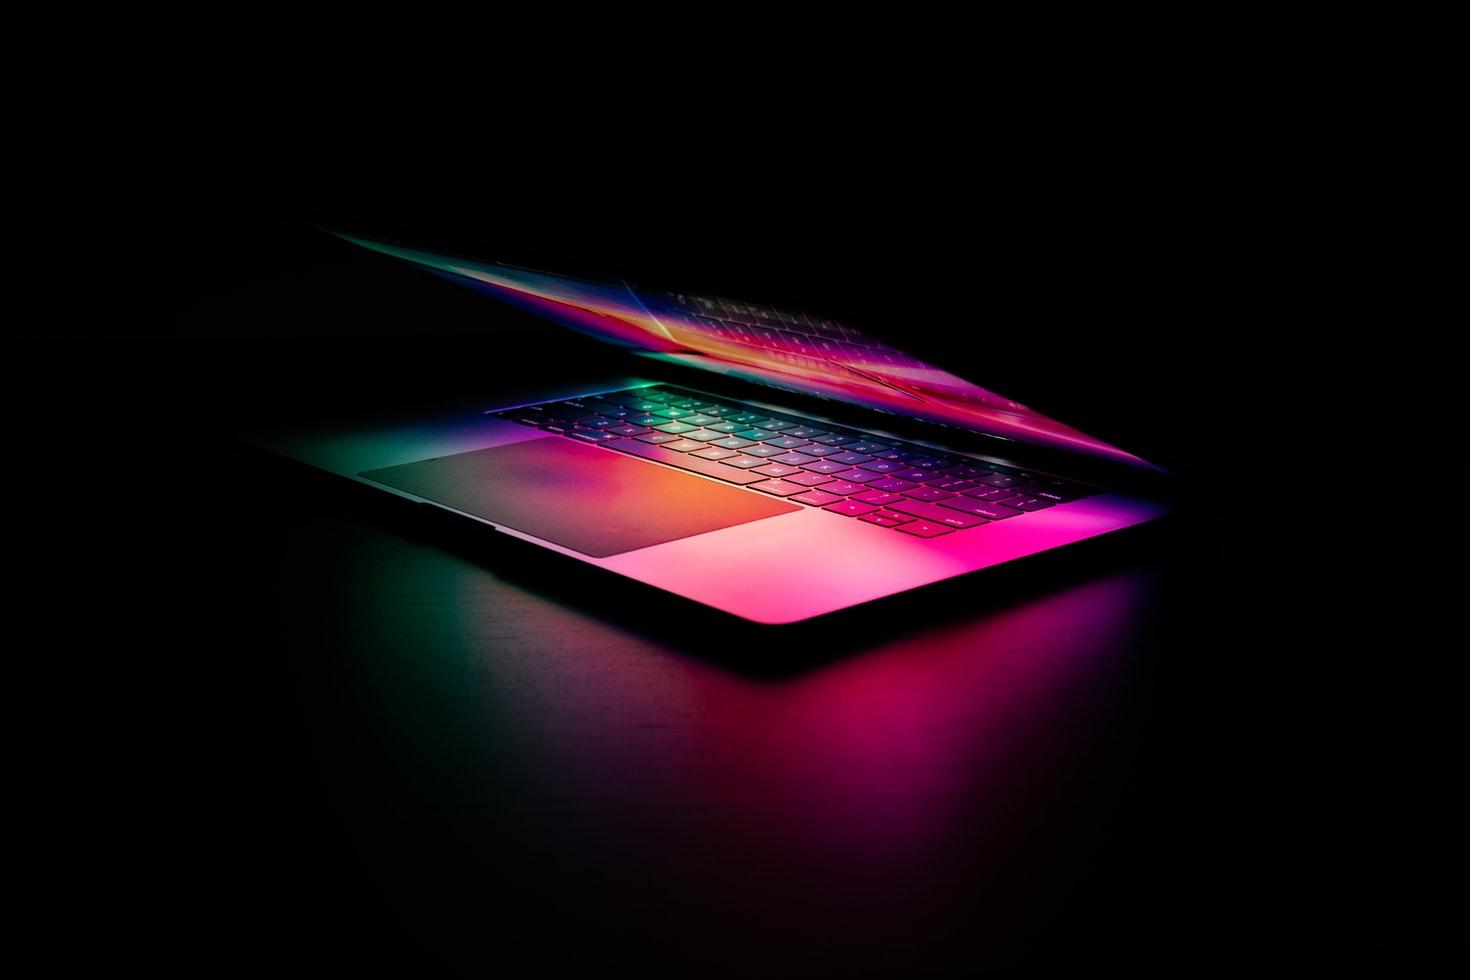 Появился скриншот с характеристиками нового MacBook Pro с процессором M1X